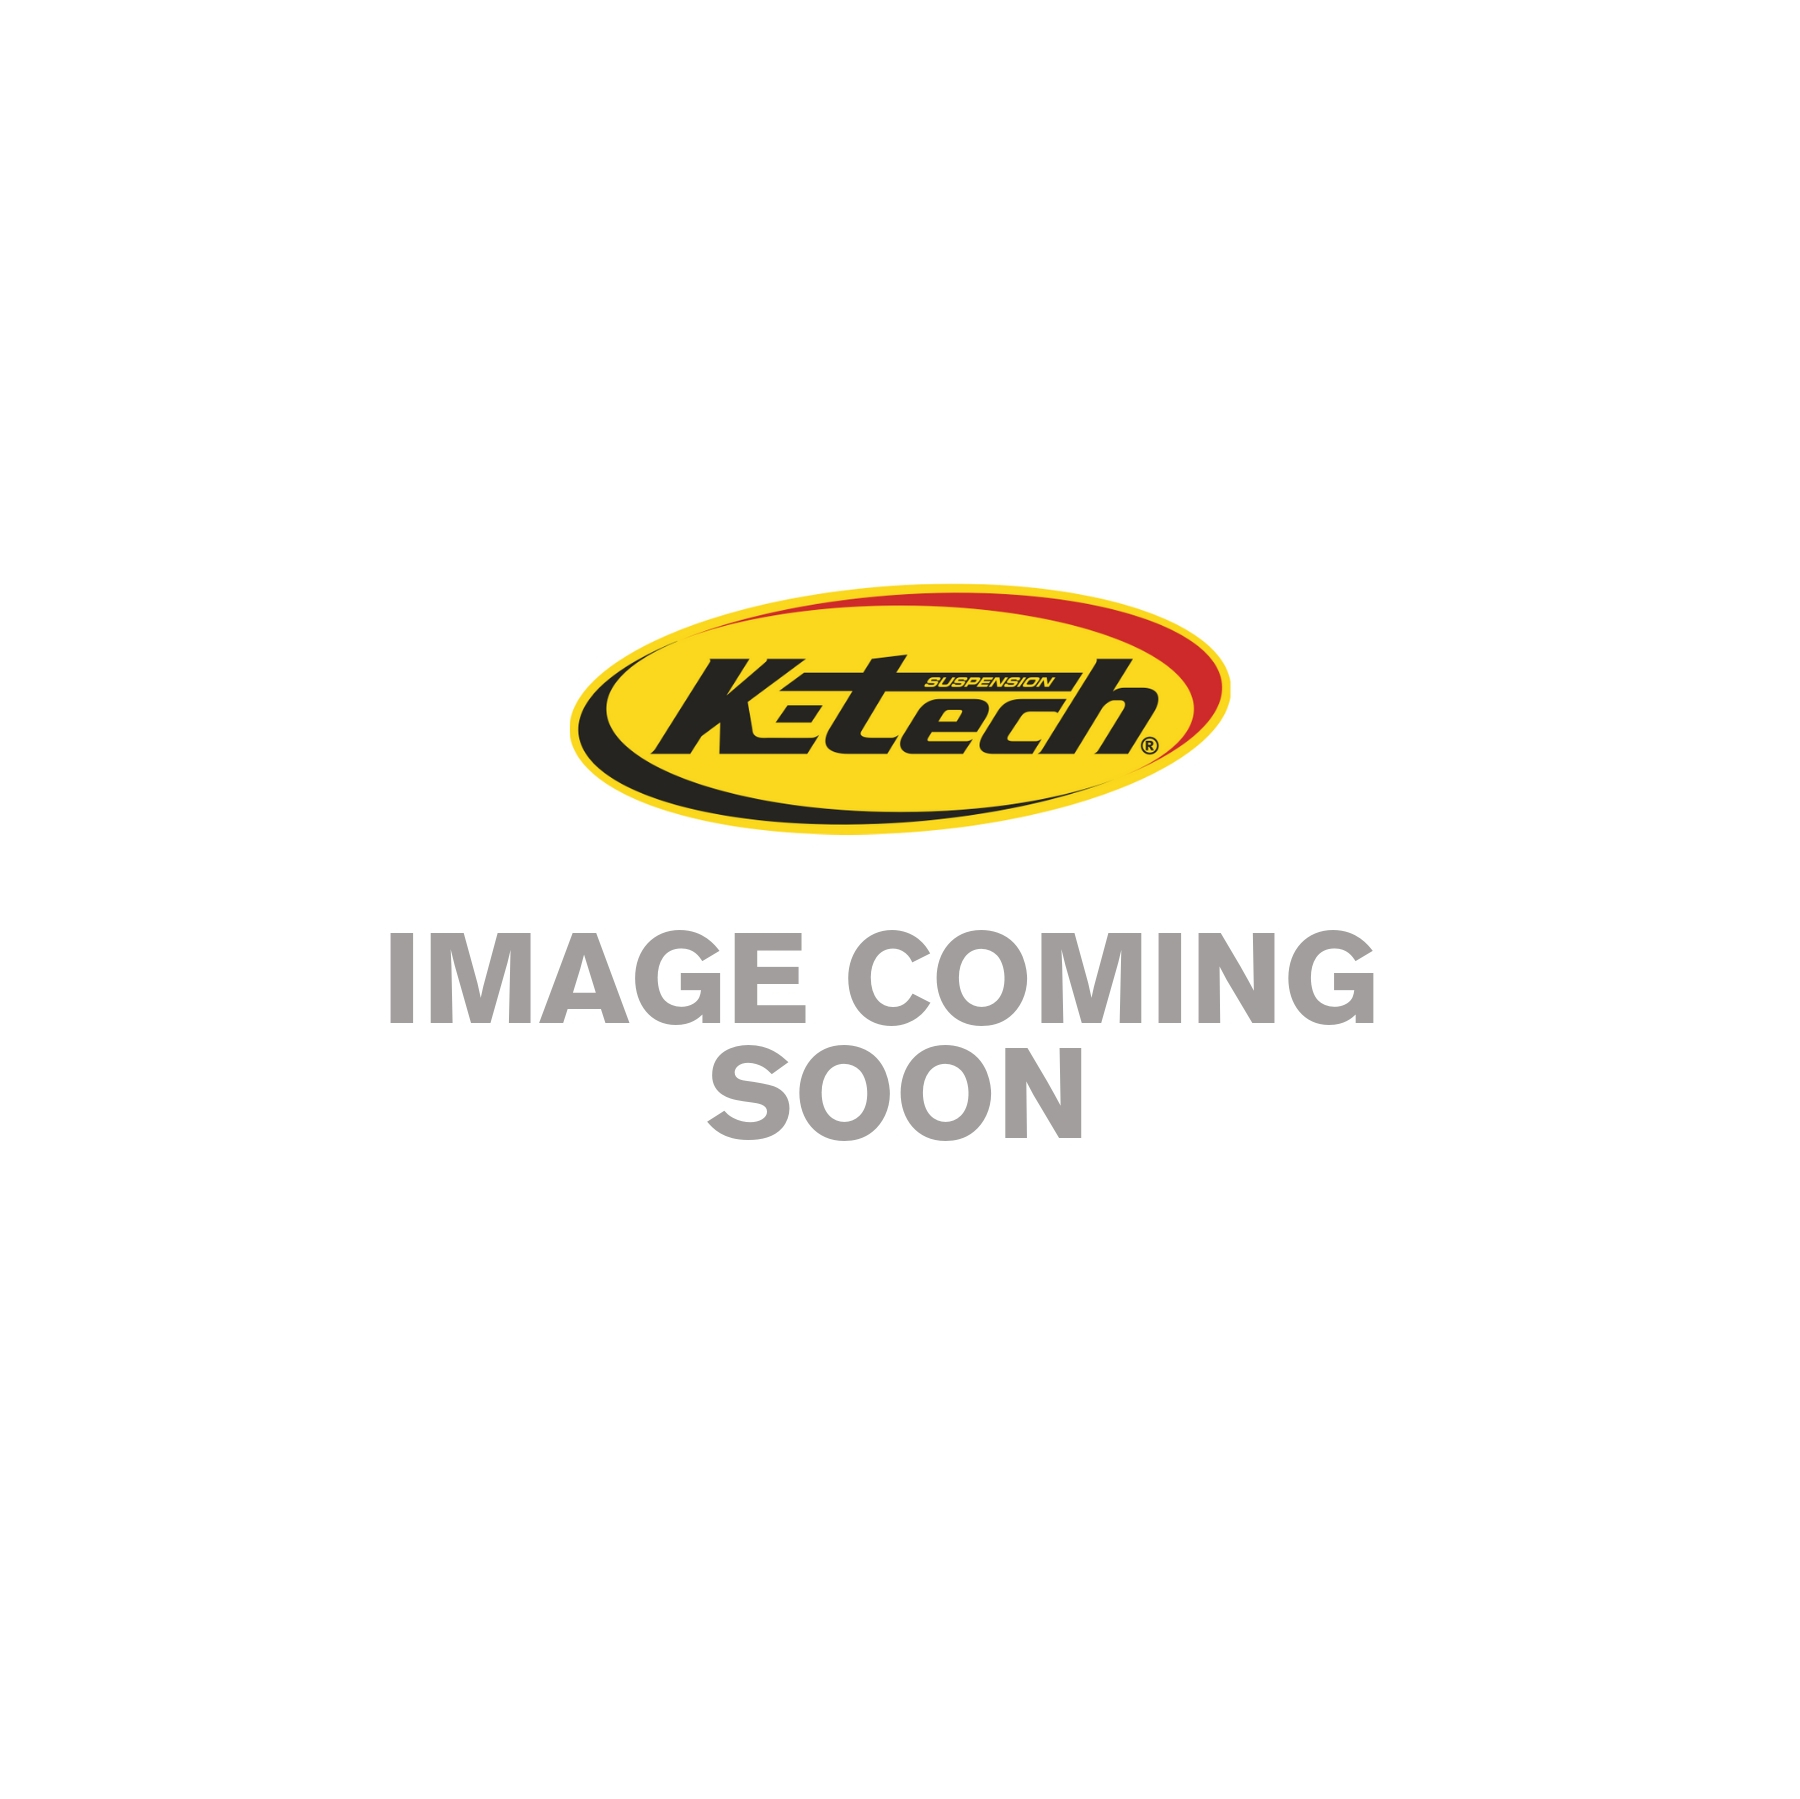 20IDS Front Fork Cartridges Yamaha FZ/MT-07 XSR700 2013> KYB